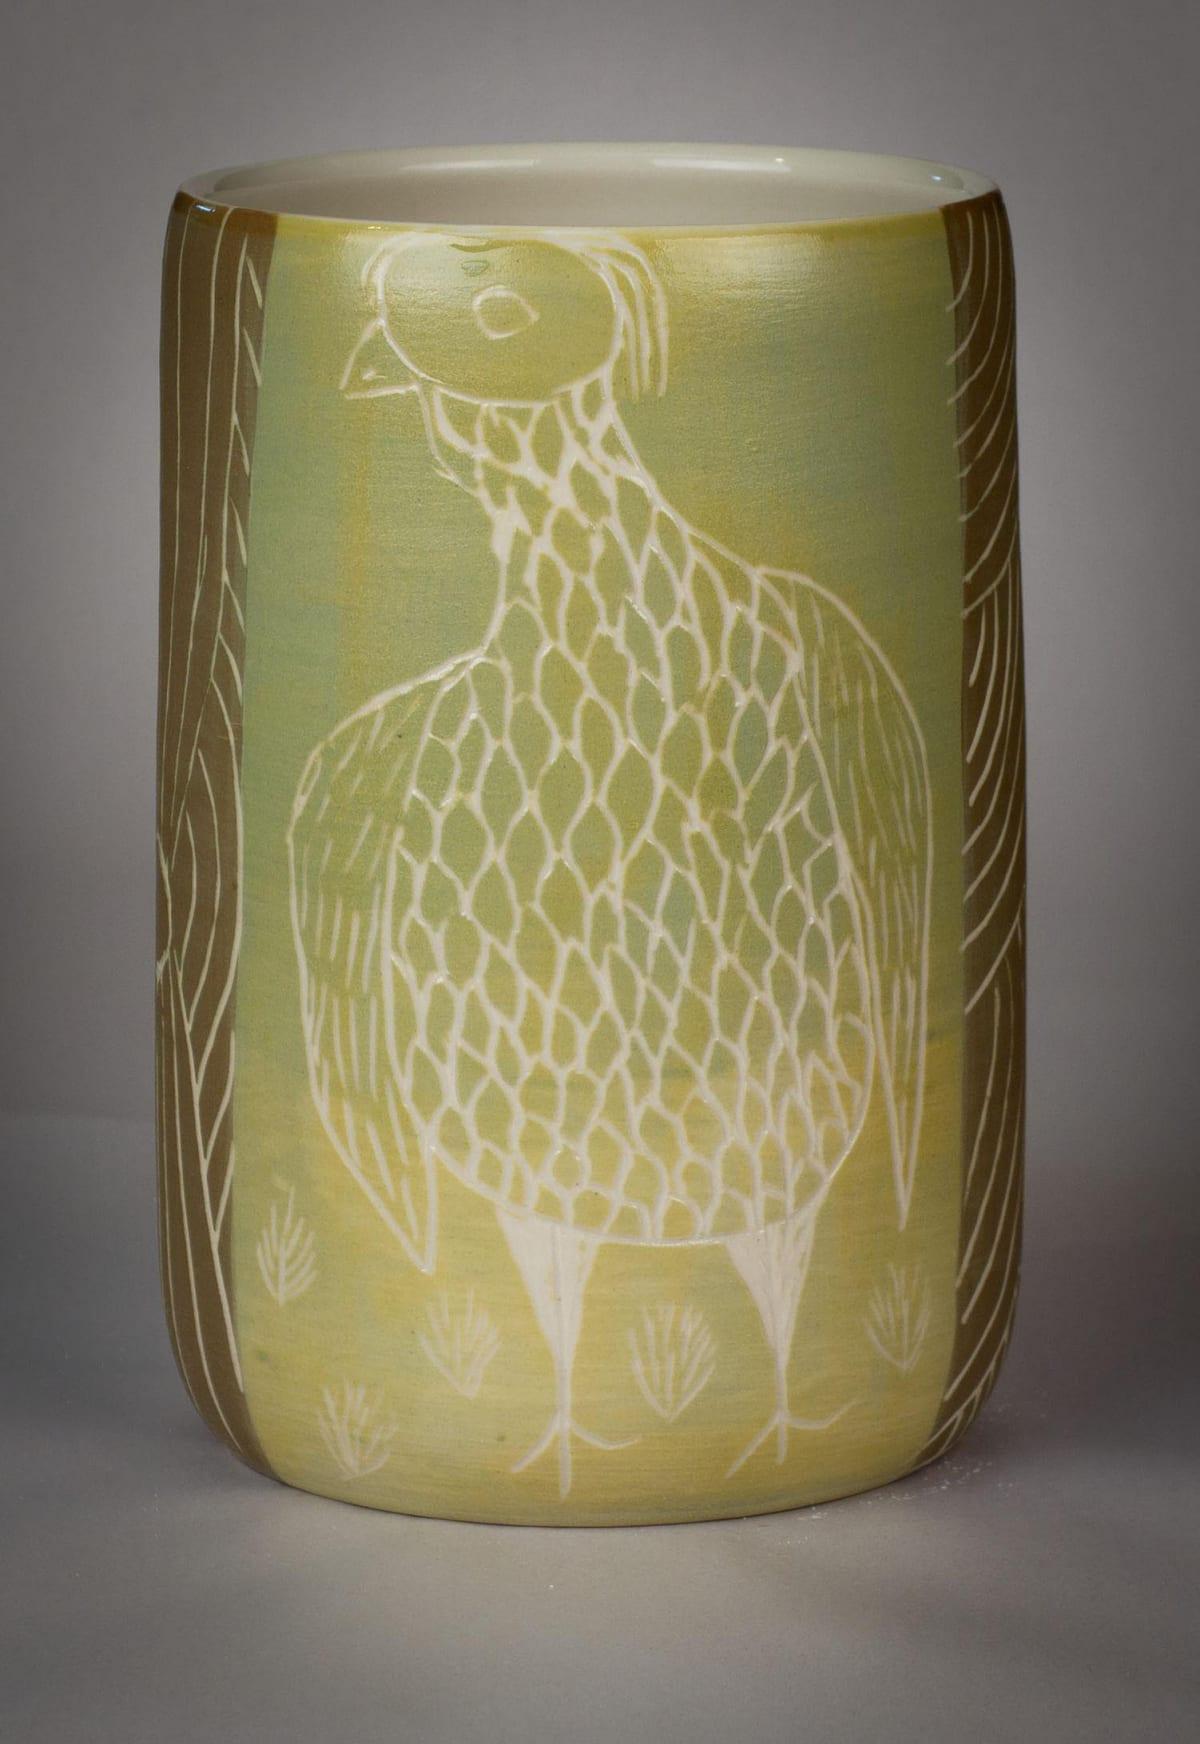 Carlene Thompson Tjulpu Stoneware 20 x 13 cm